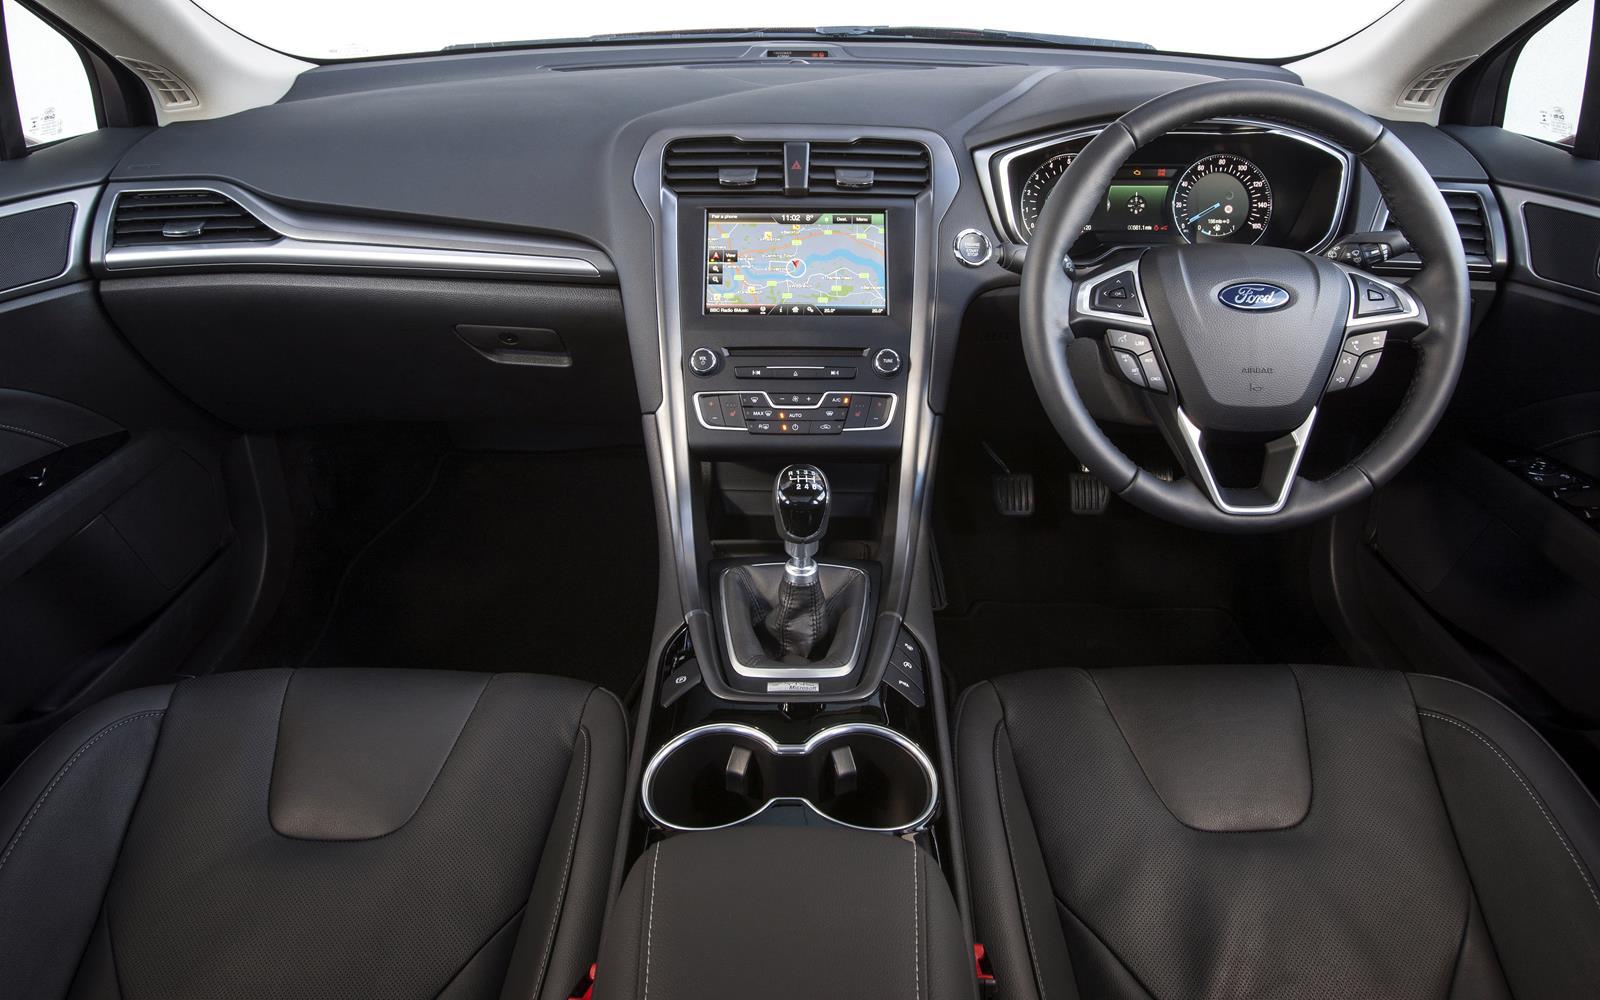 Ford Mondeo 2015 Interior >> Ford Mondeo 2015 Interior Front Seat Driver